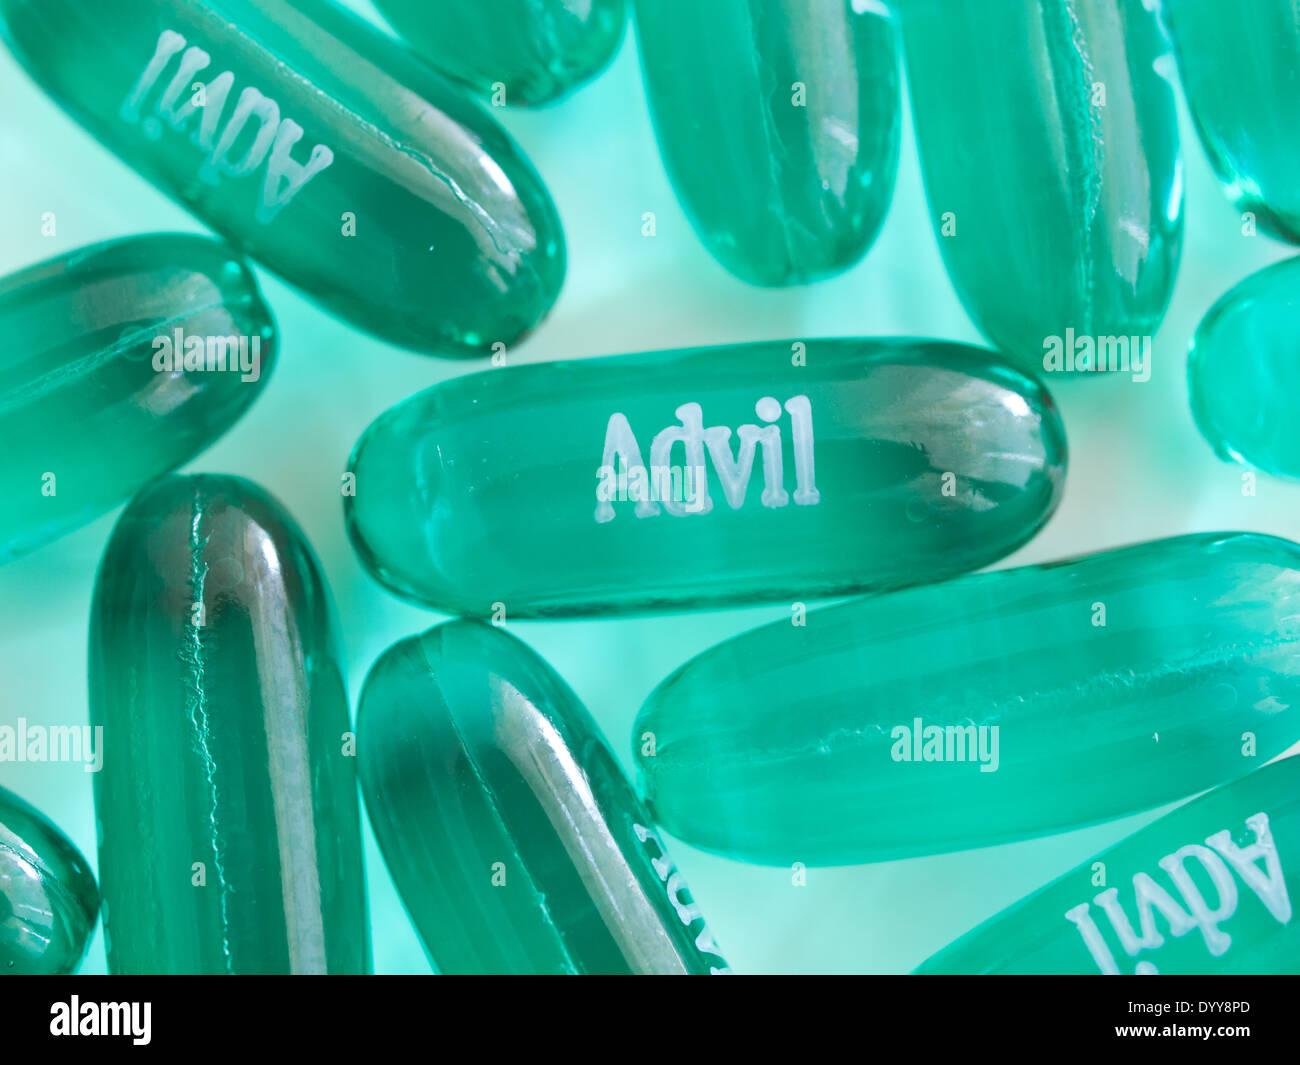 advil liqui-gel capsules stock photo: 68826421 - alamy